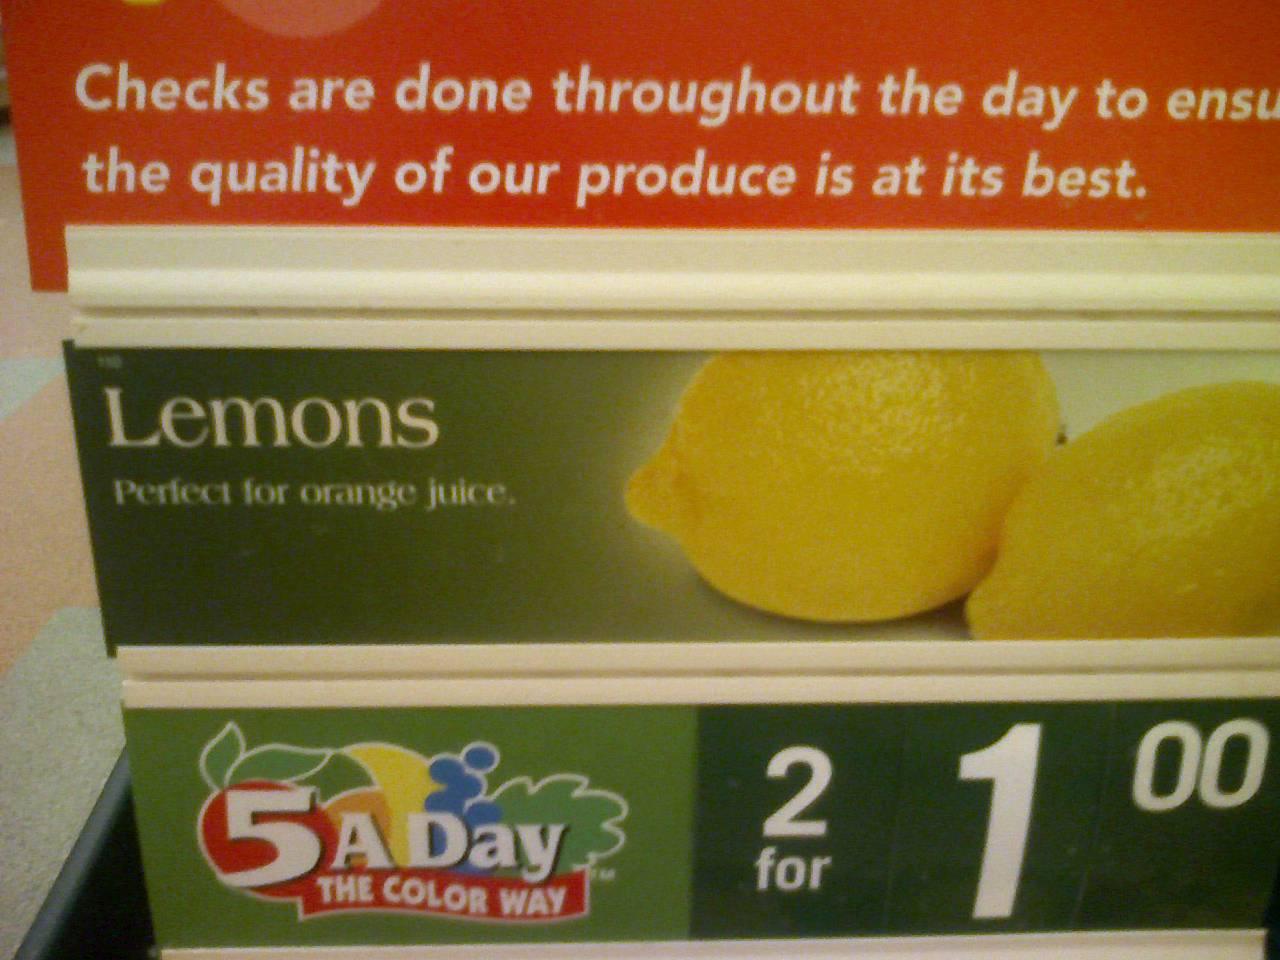 Lemons – Perfect for orange juice